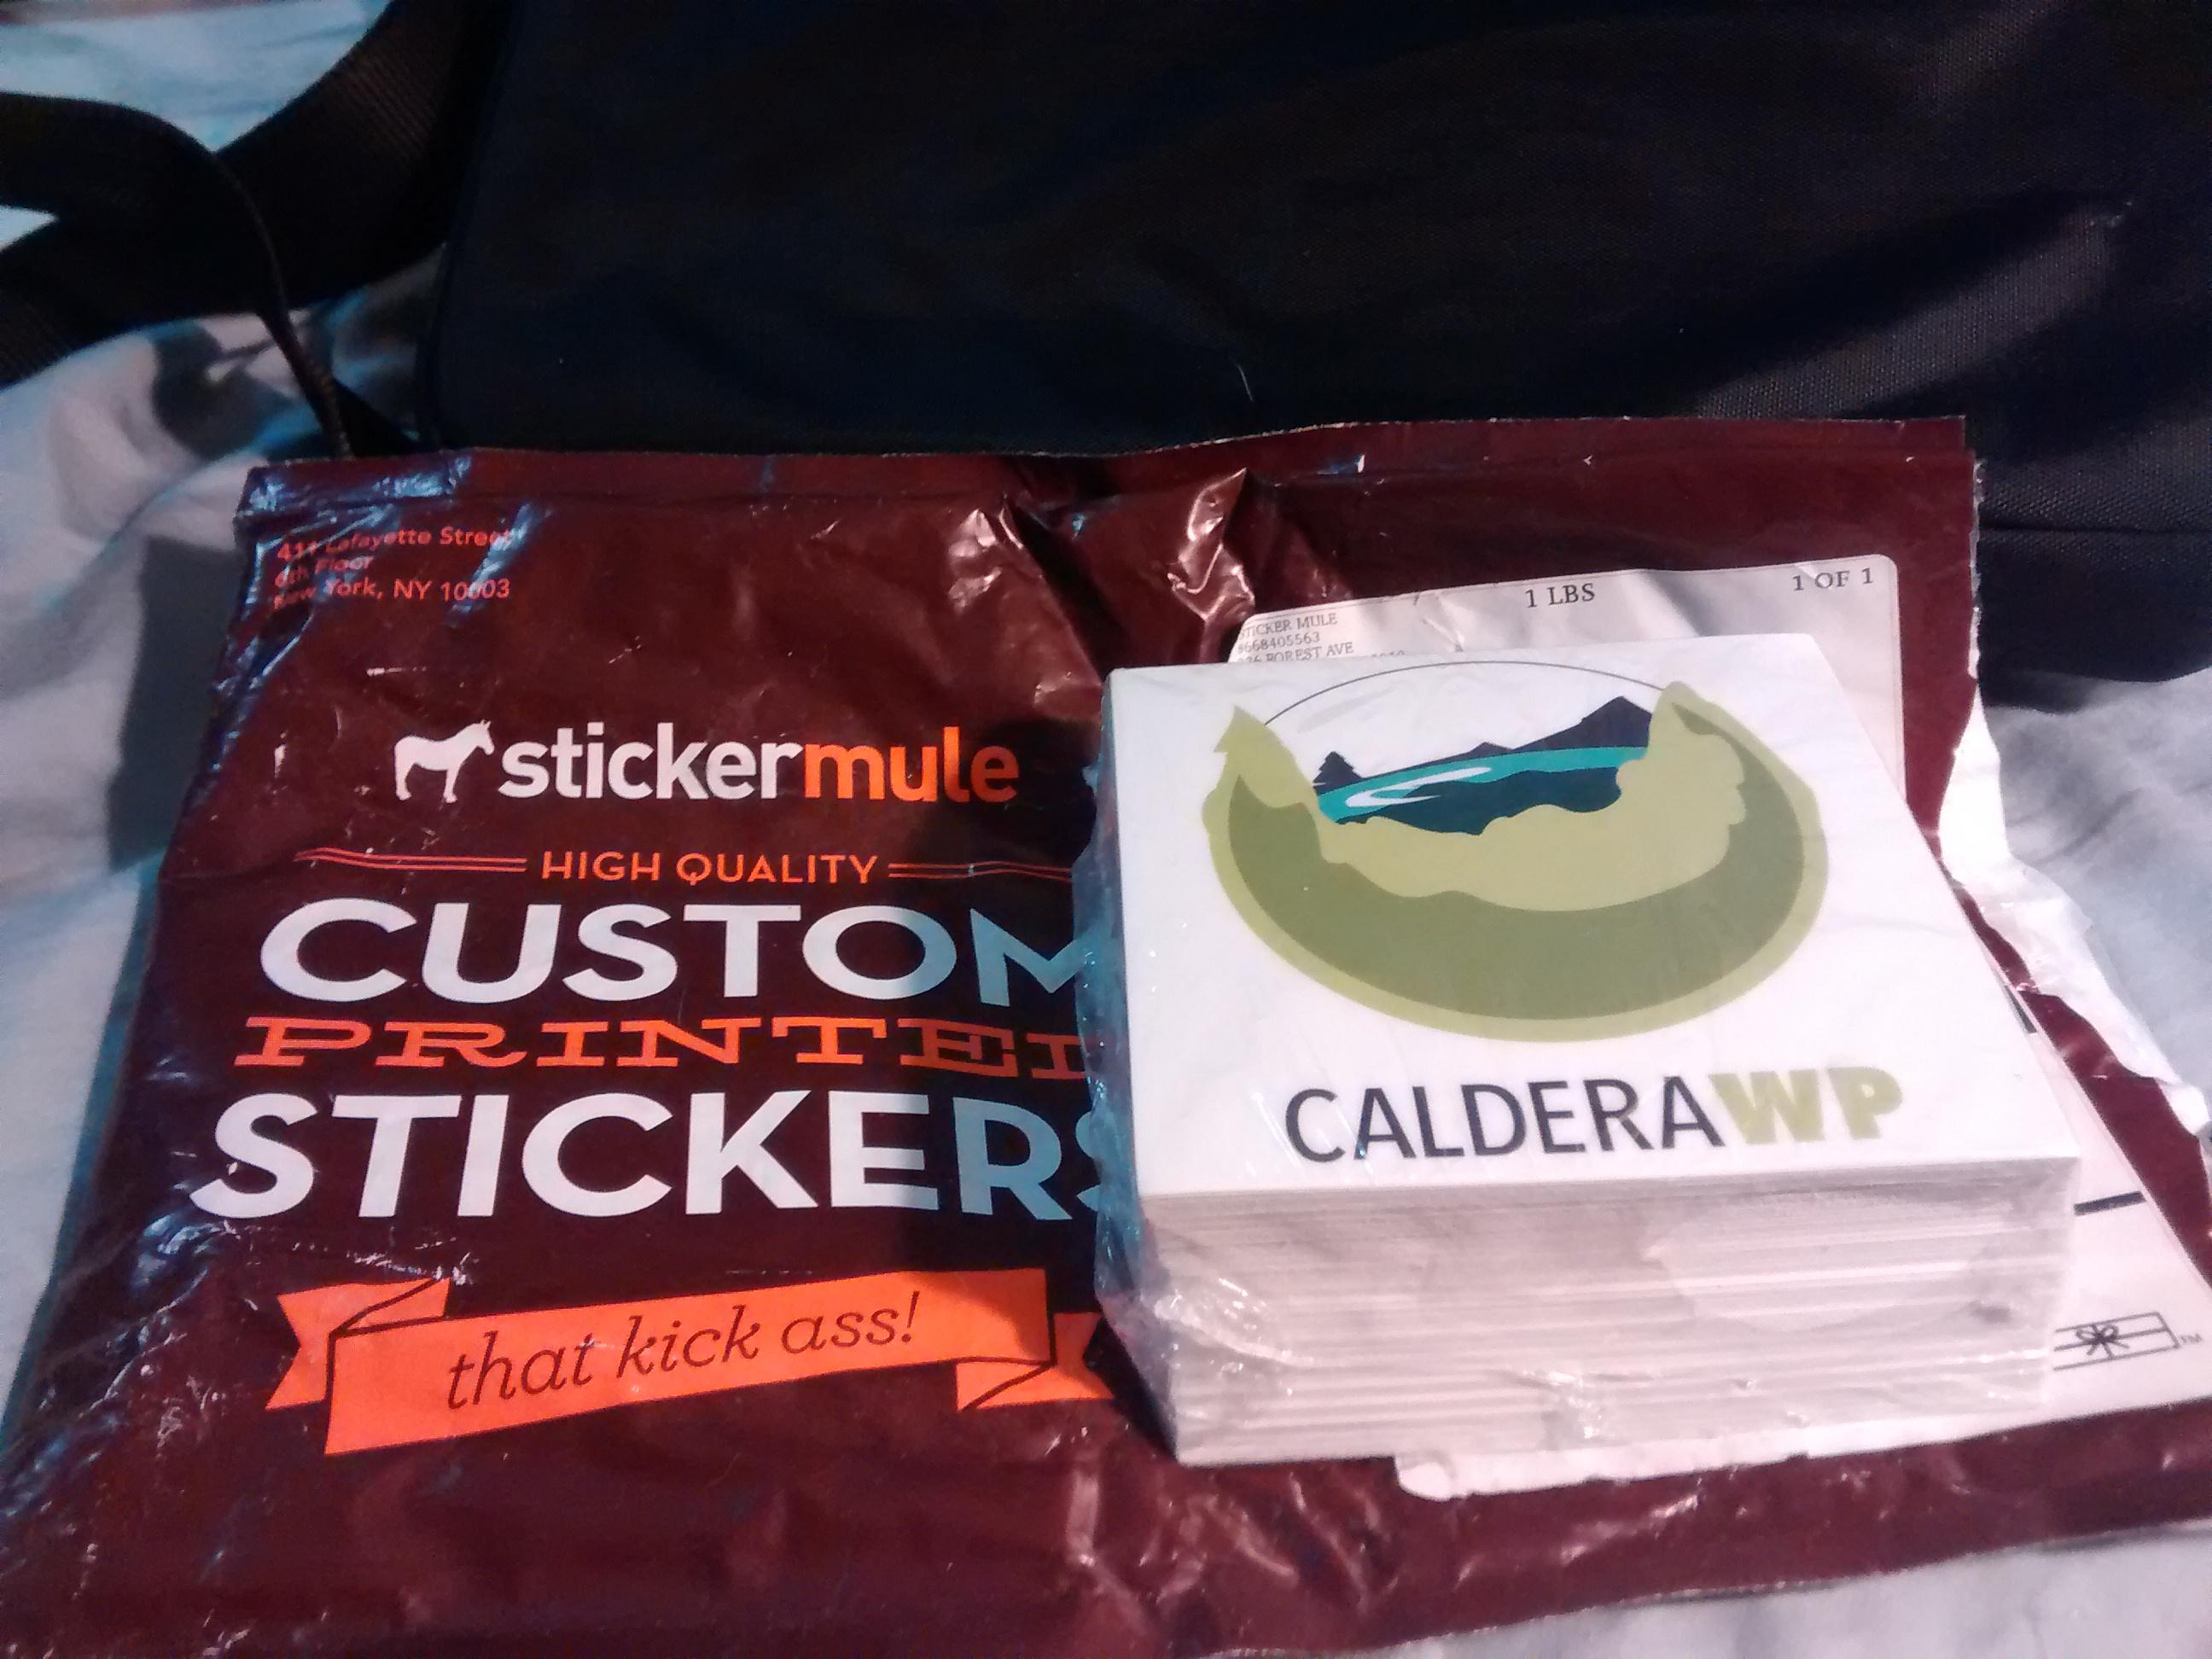 CalderaWP Stickers